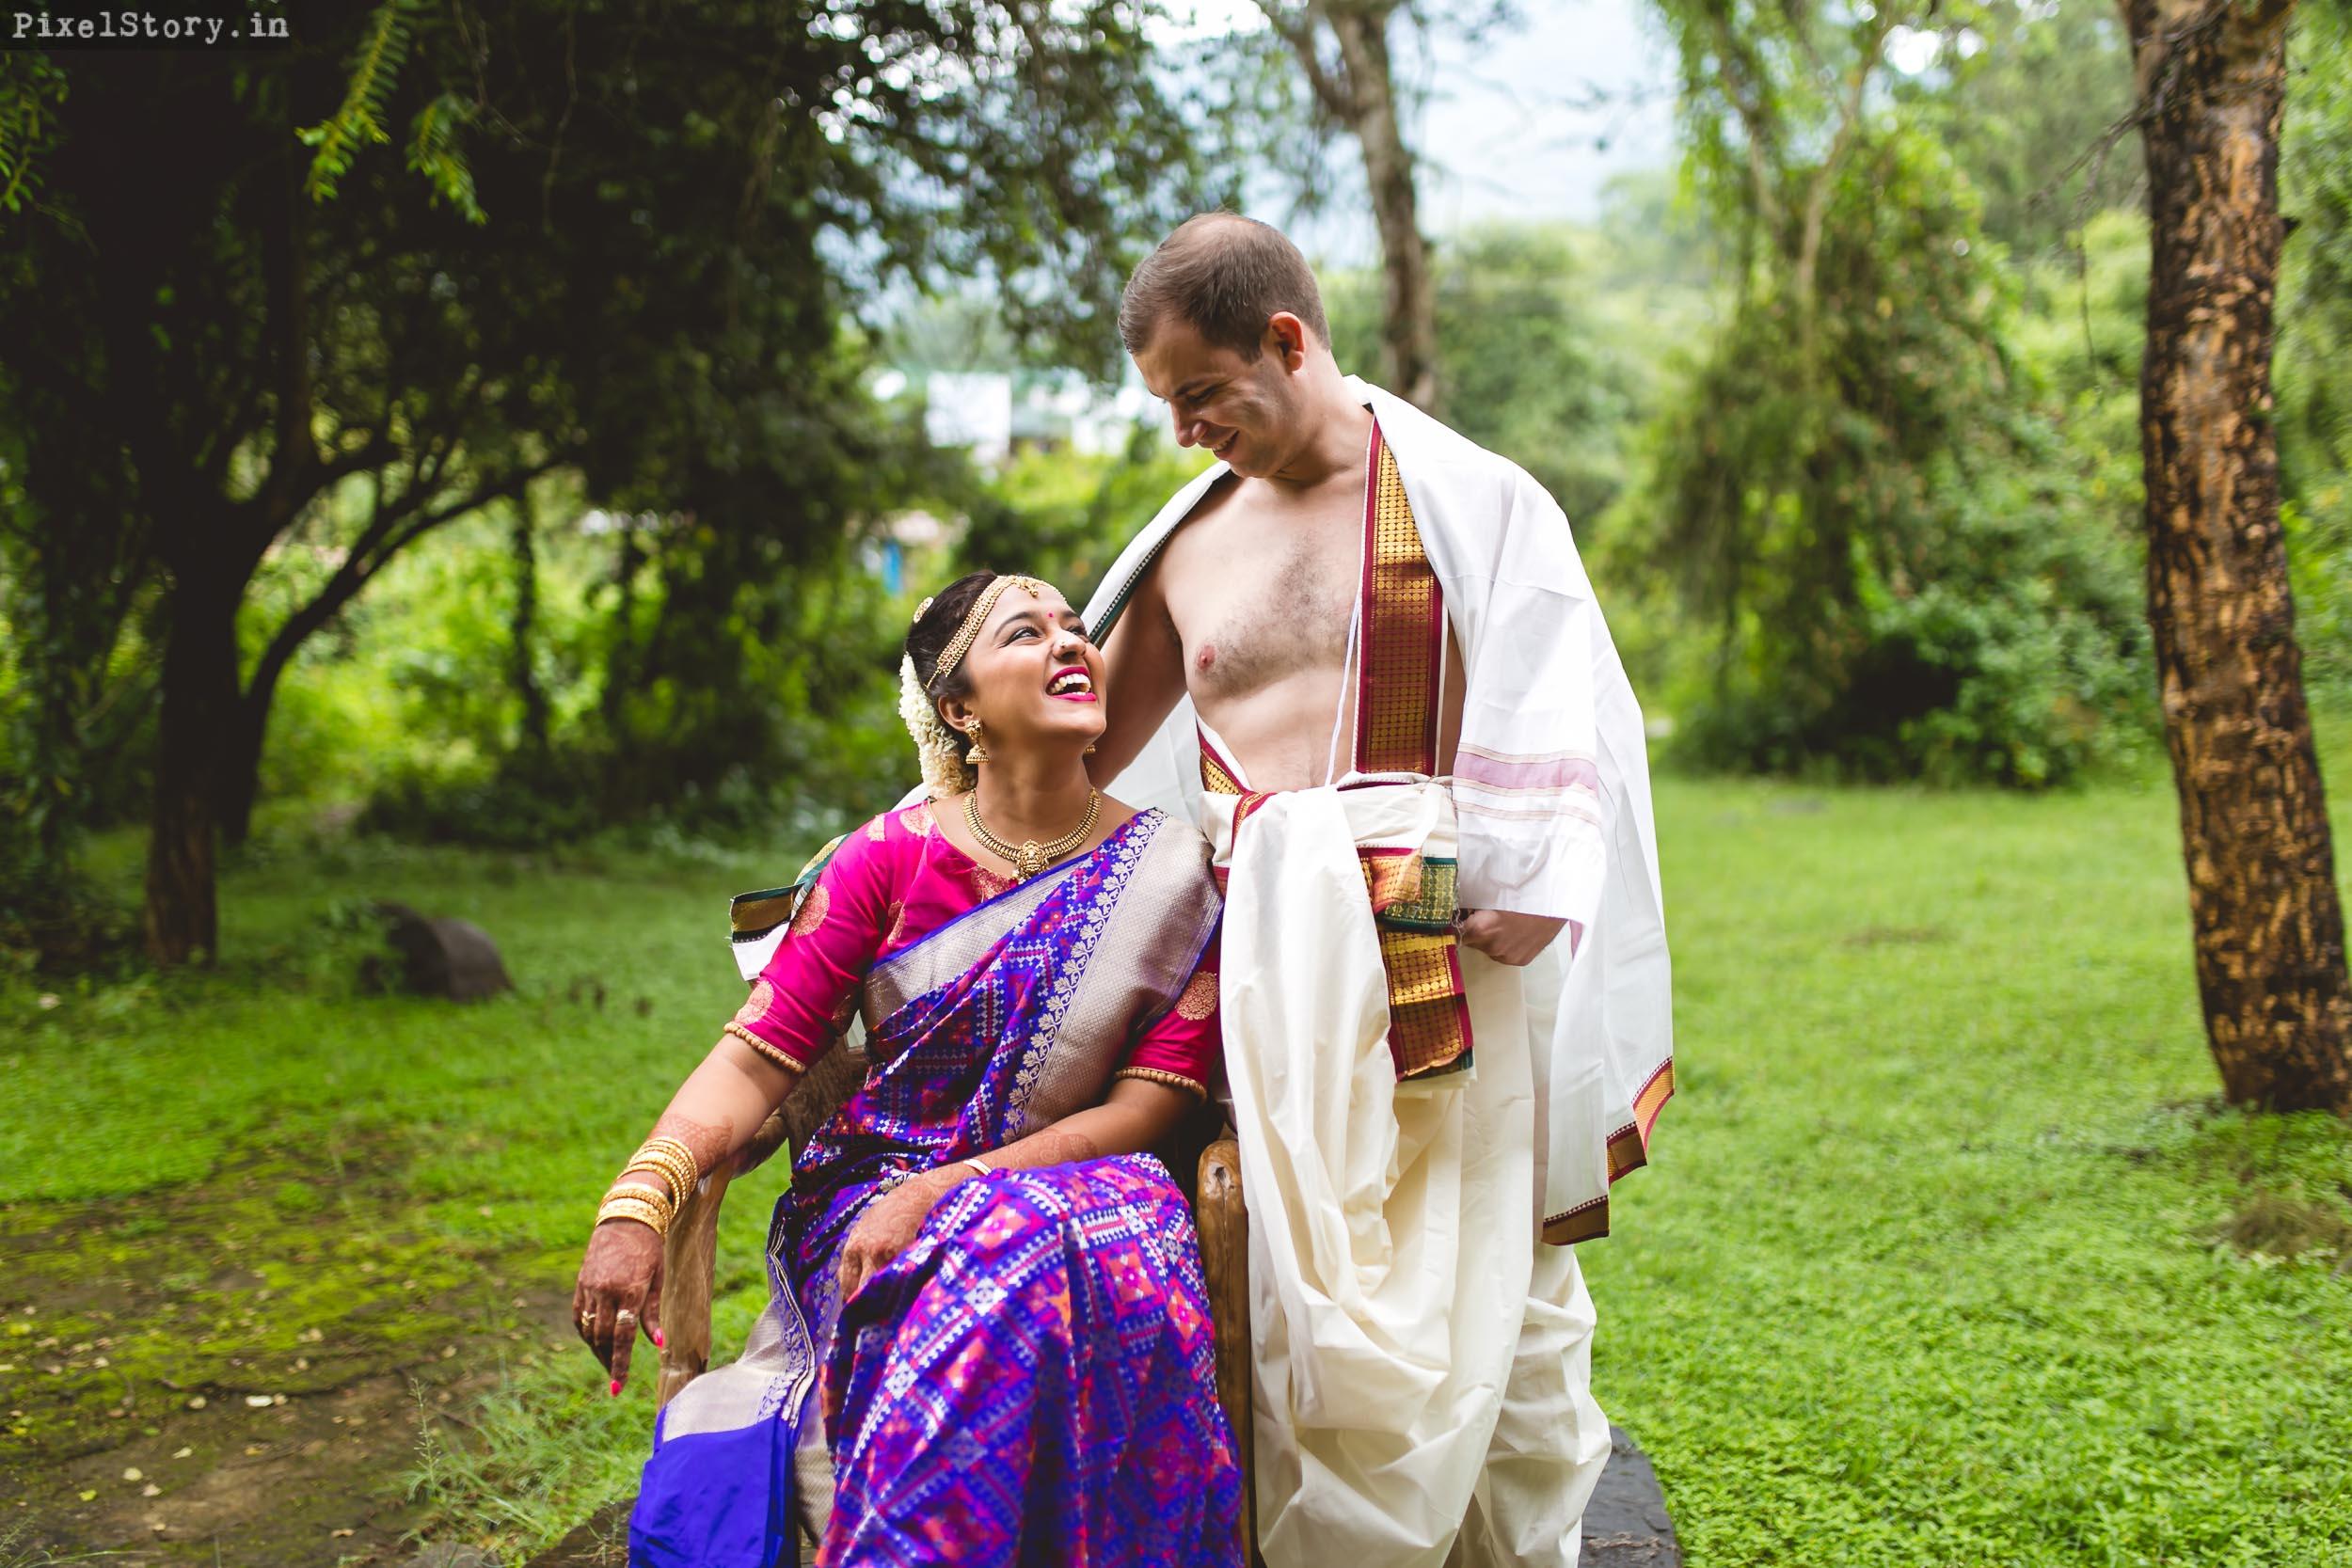 PixelStory-Jungle-Wedding-Photographer-Masinagudi-Indo-French016.jpg